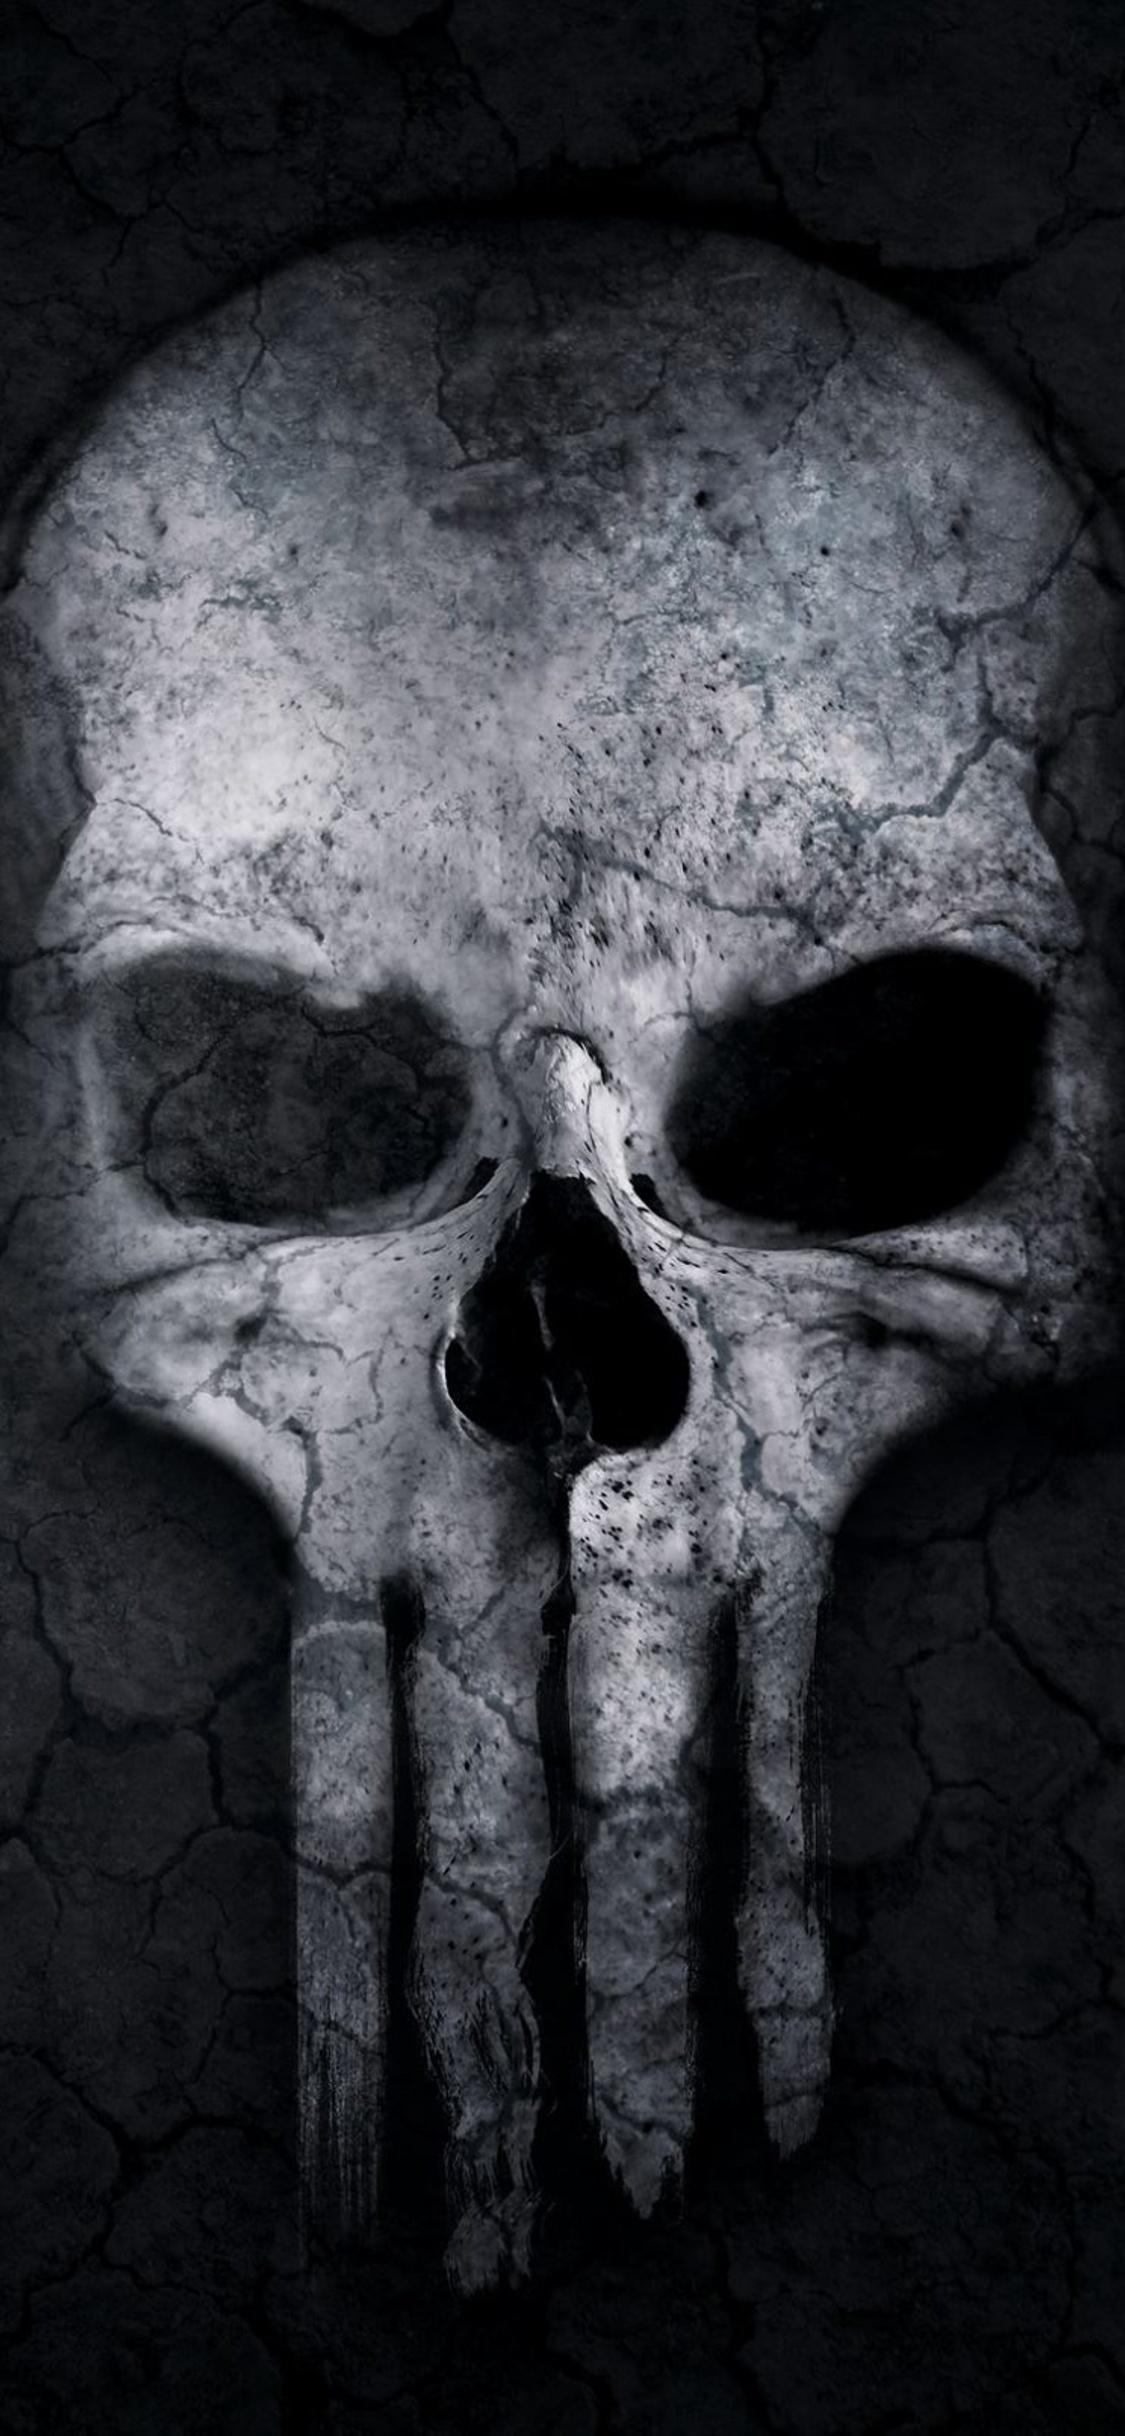 1125x2436 Punisher Skull Artwork Iphone XS,Iphone 10 ...